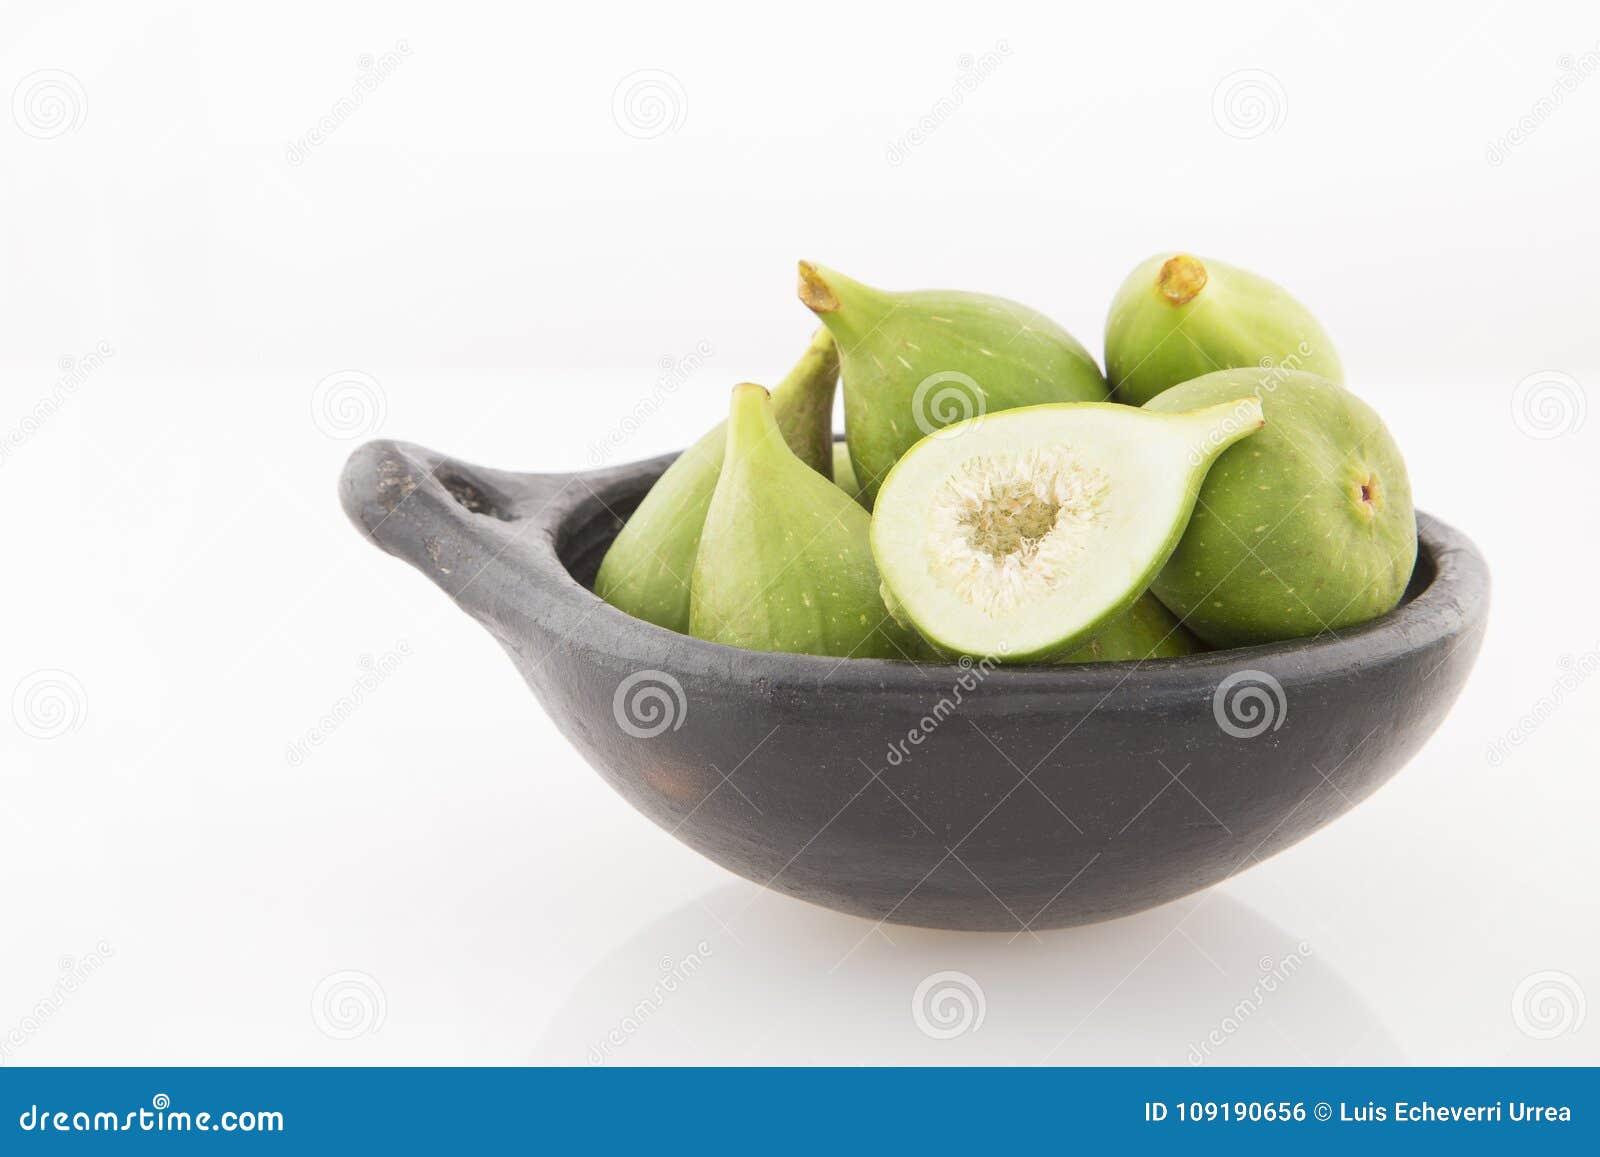 Figos verdes no fundo branco - Ficus Carica